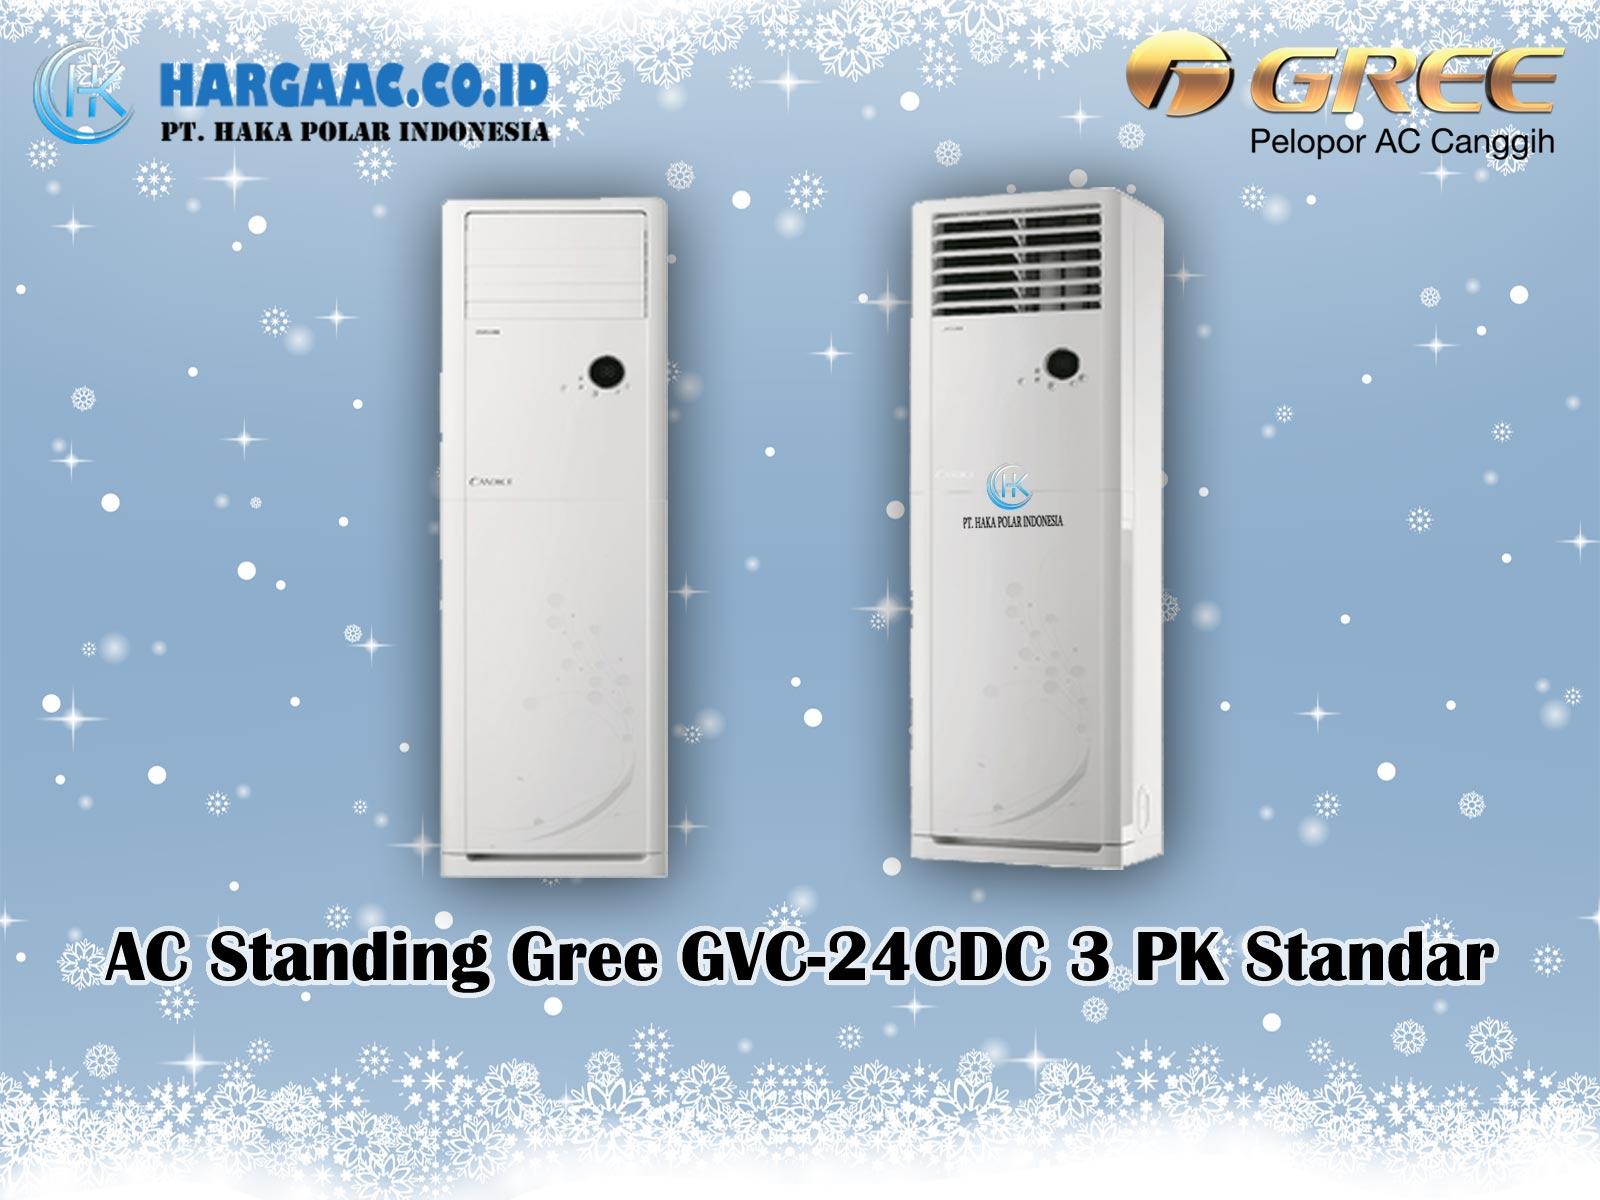 Harga Jual AC Standing Gree GVC-24CDC 3 PK Standar (Candice)